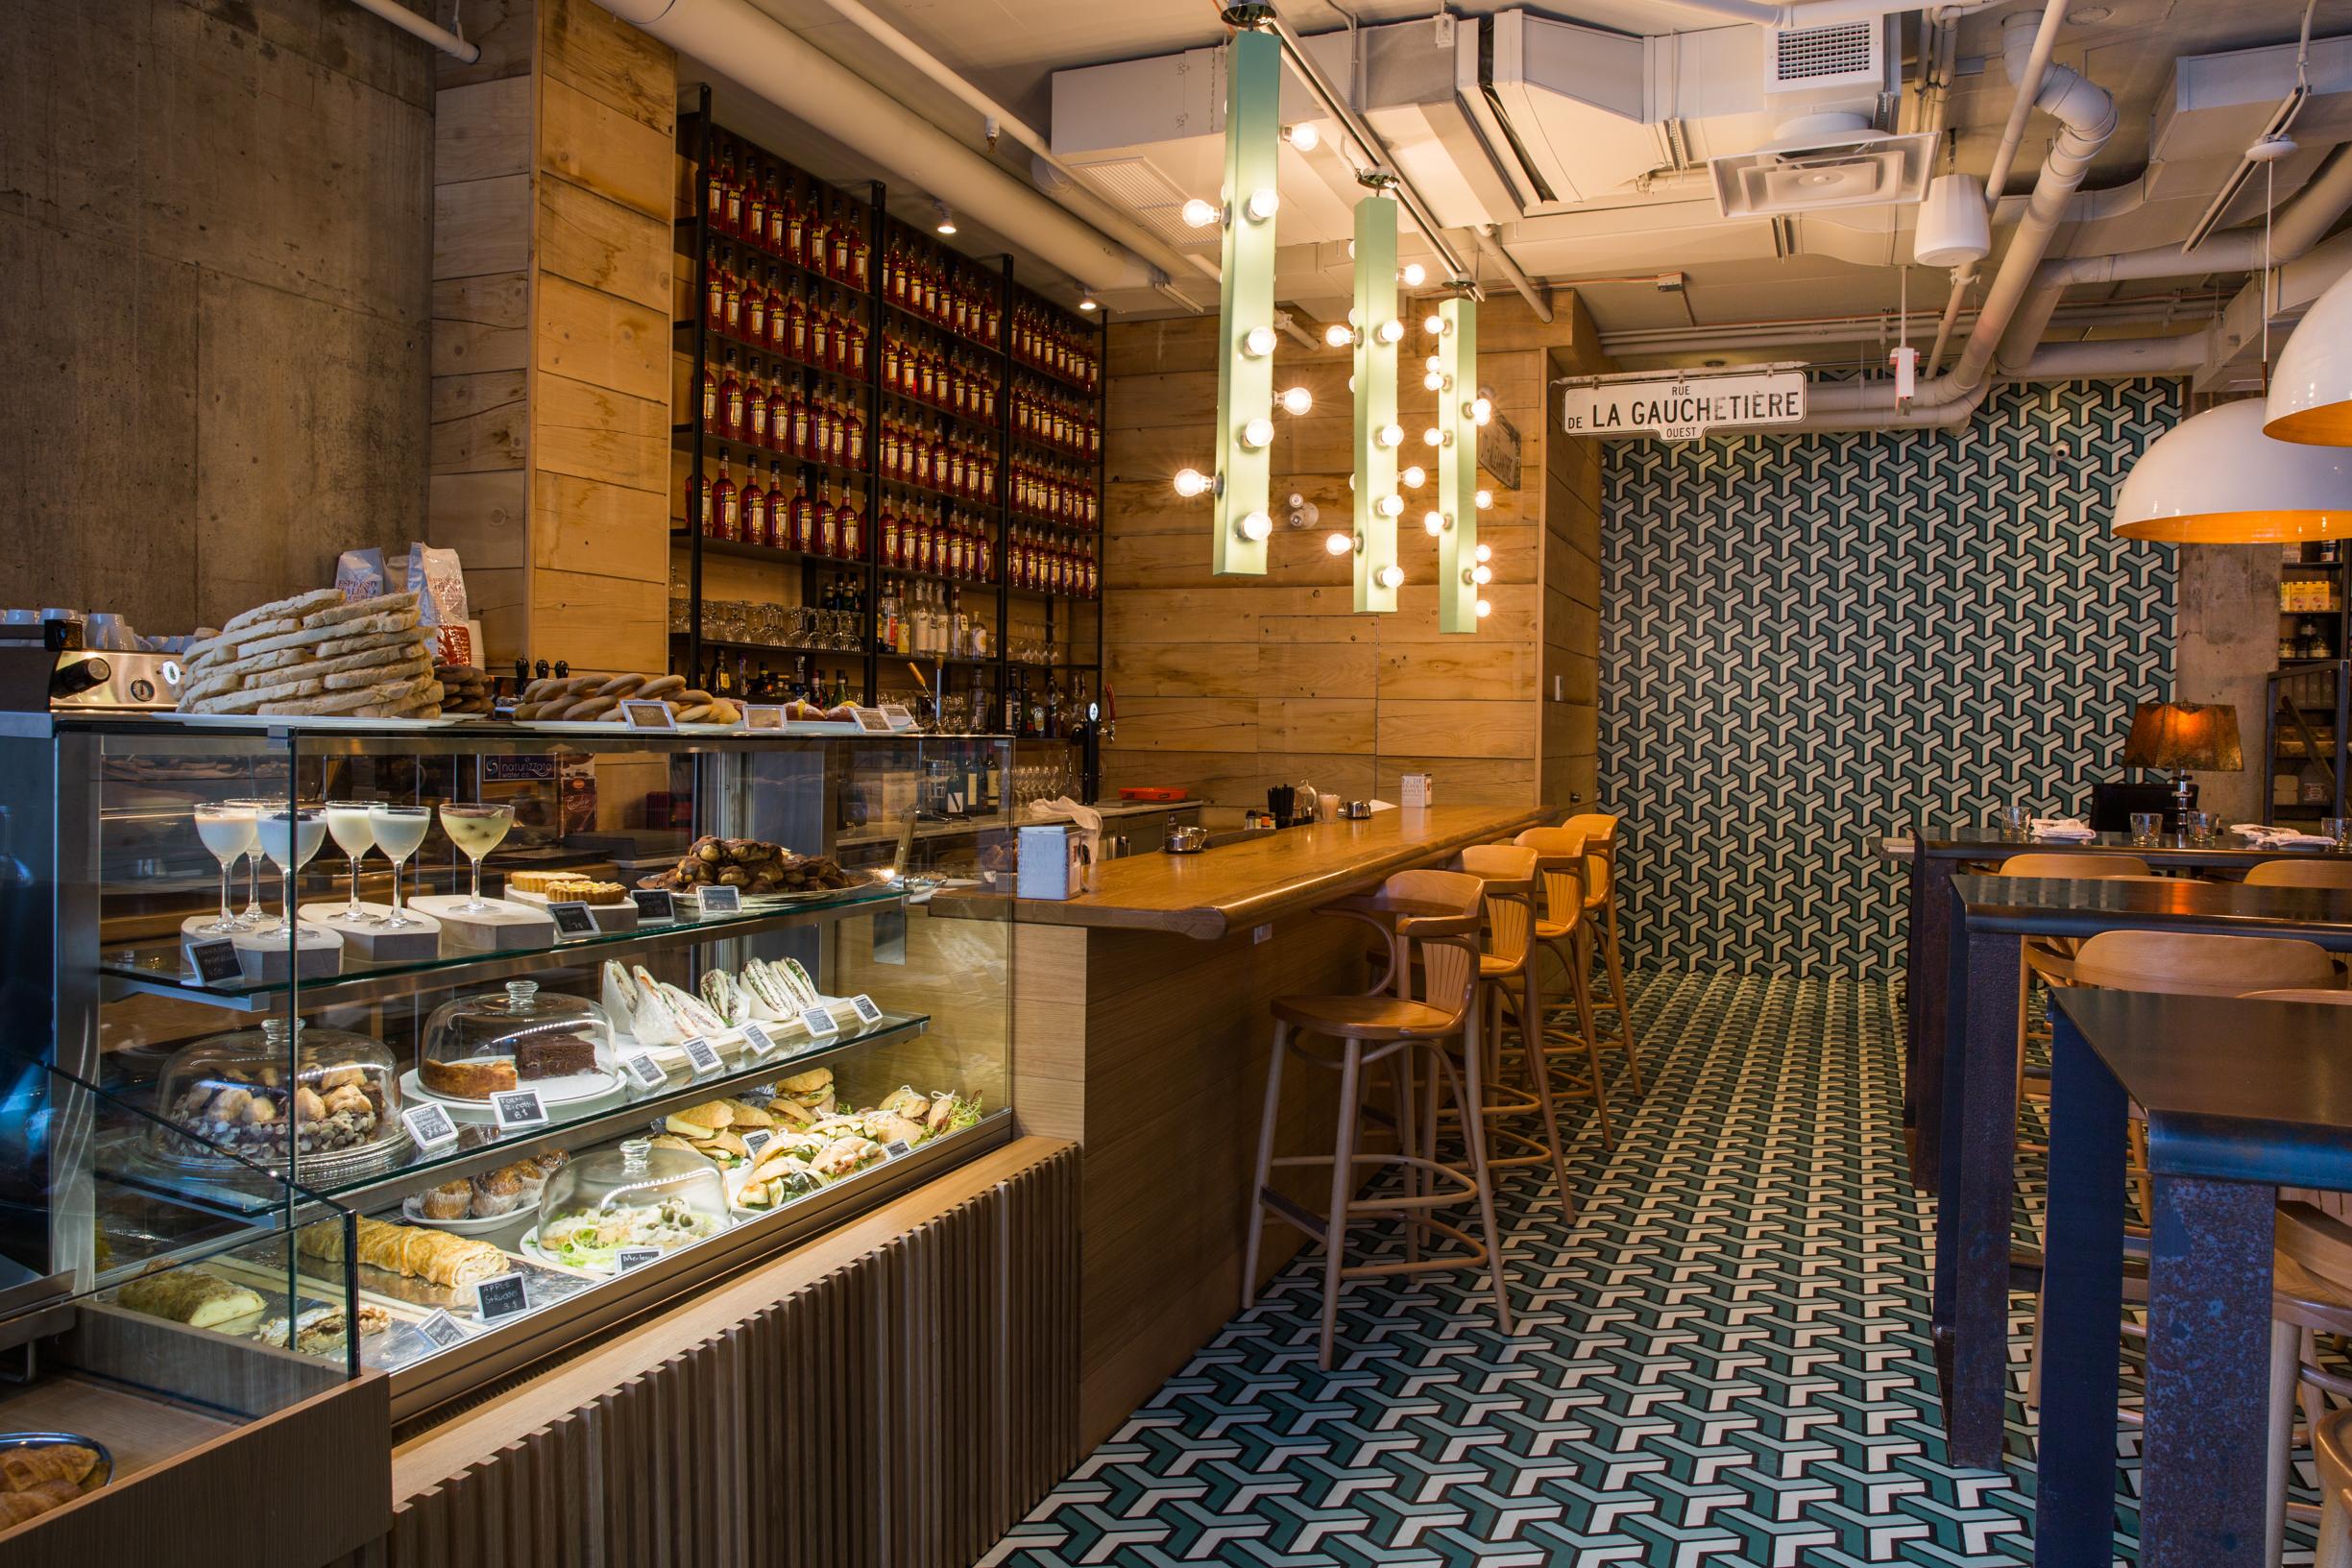 fiorellino snack bar by blogger mademoiselle jules